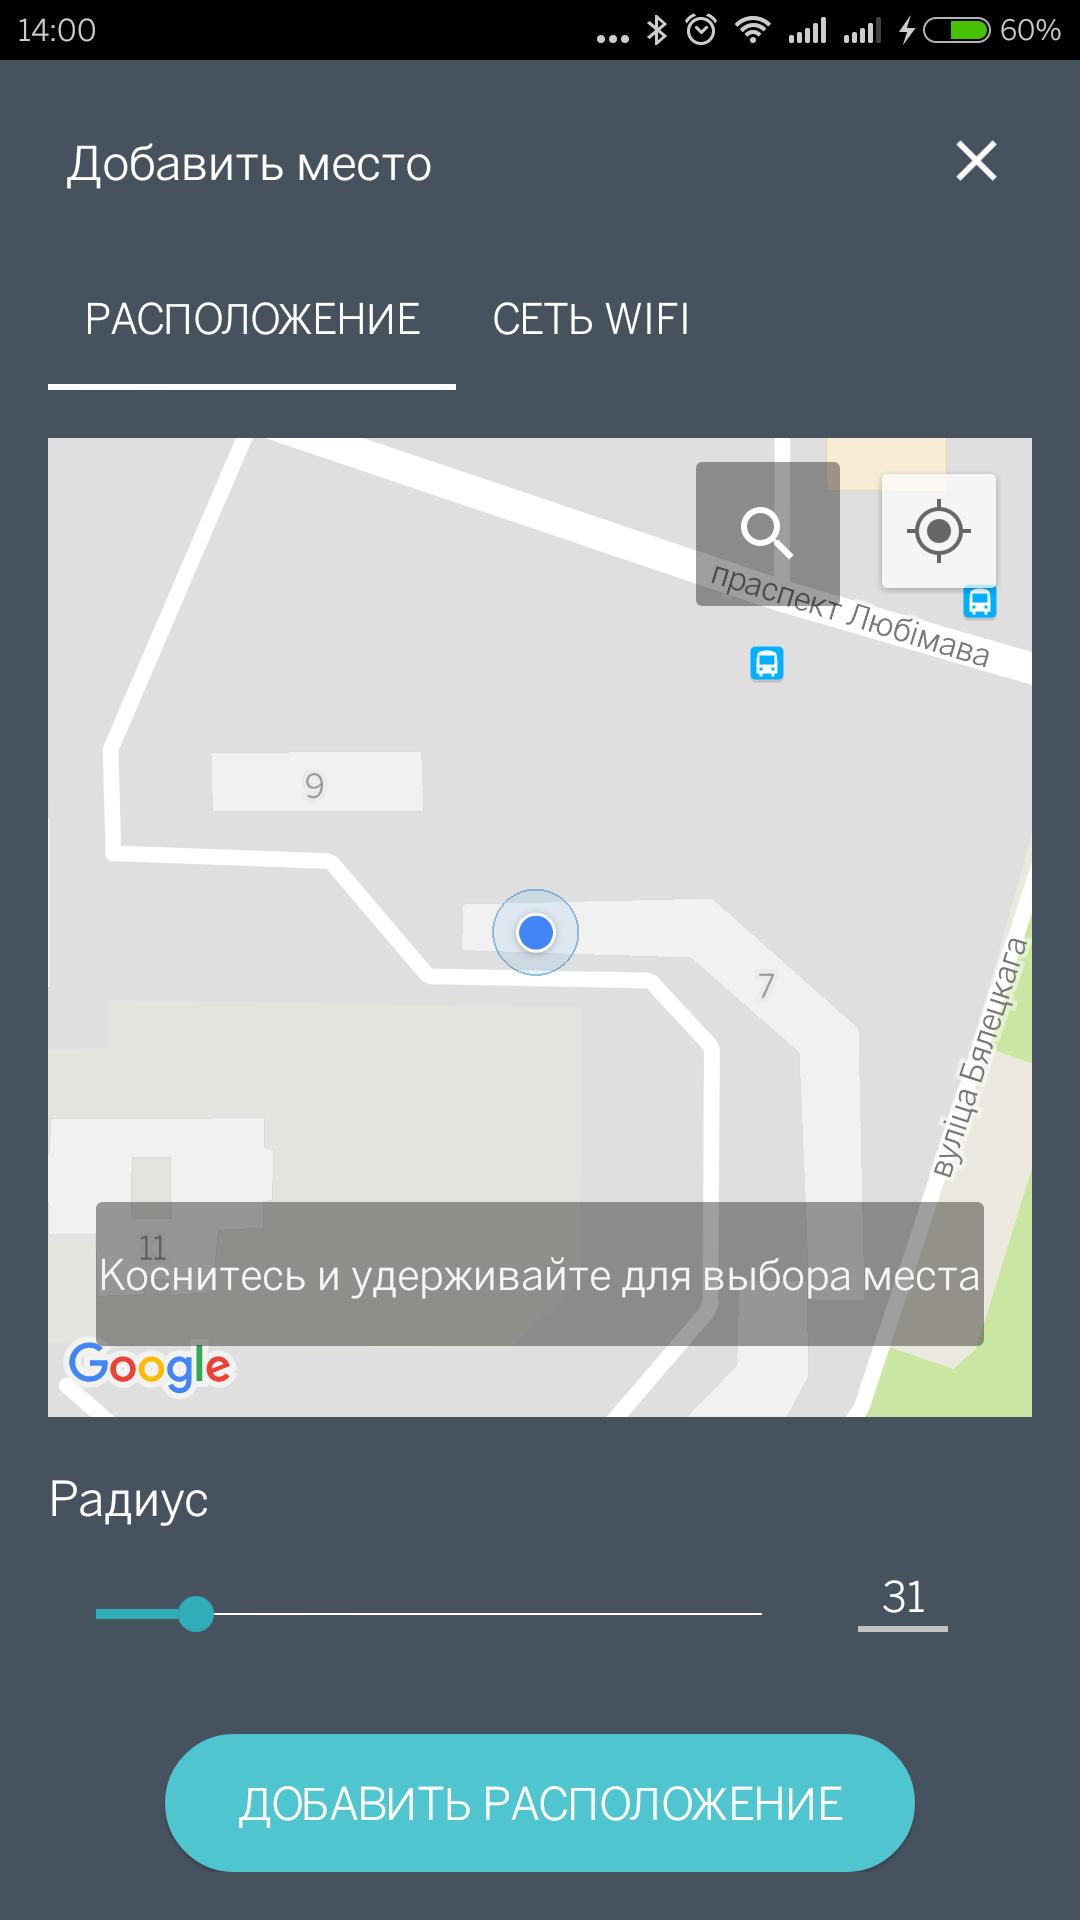 screenshot_2017-07-18-14-00-43